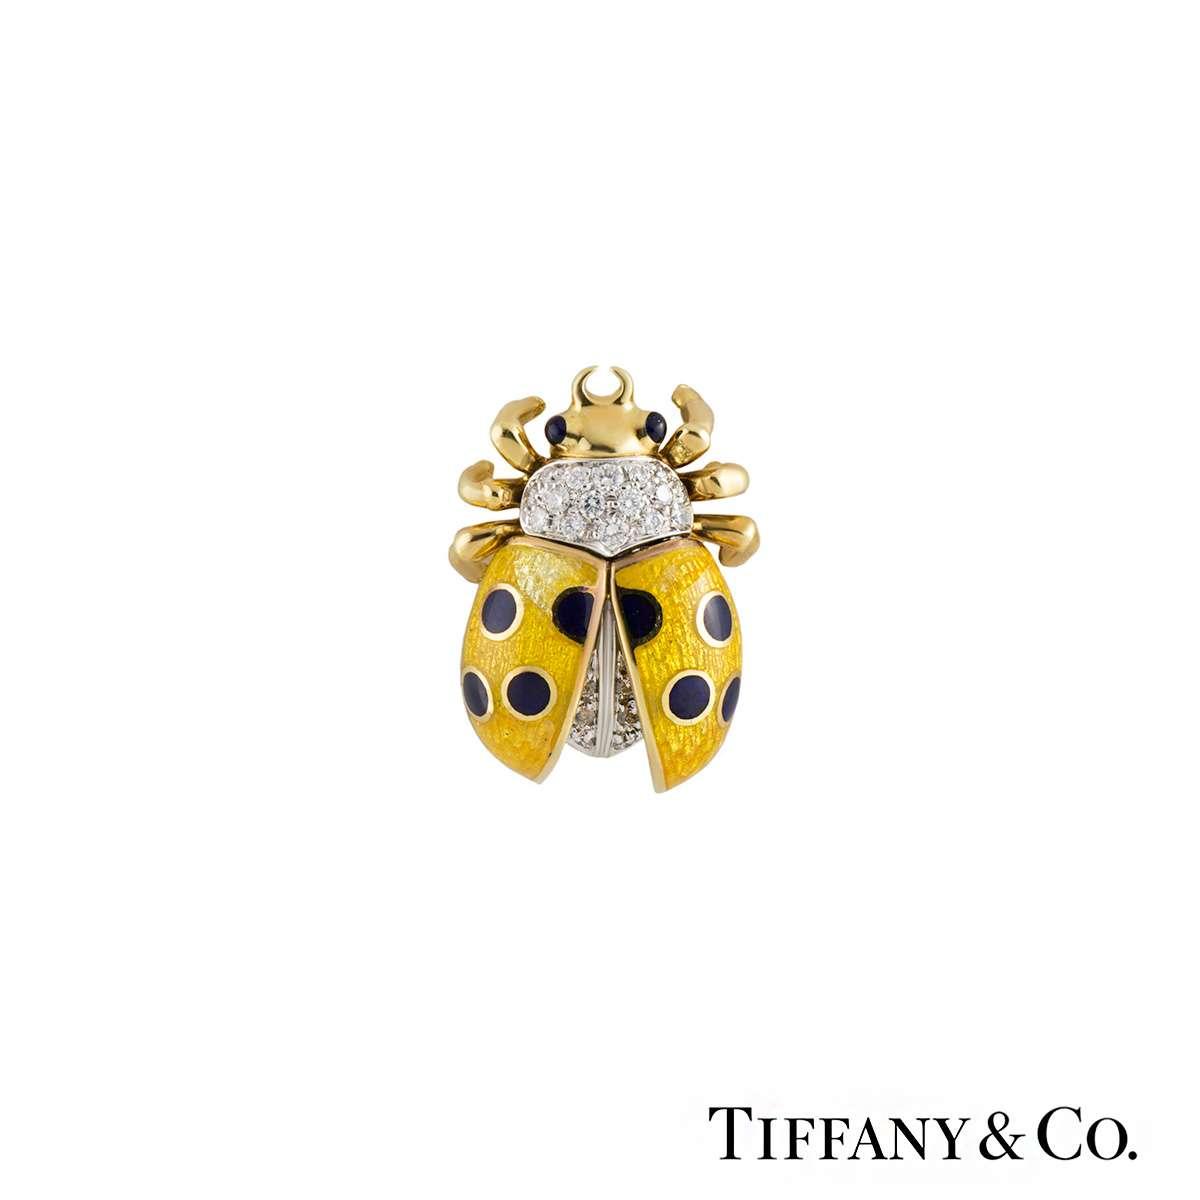 Tiffany & Co. Ladybird Diamond Brooch